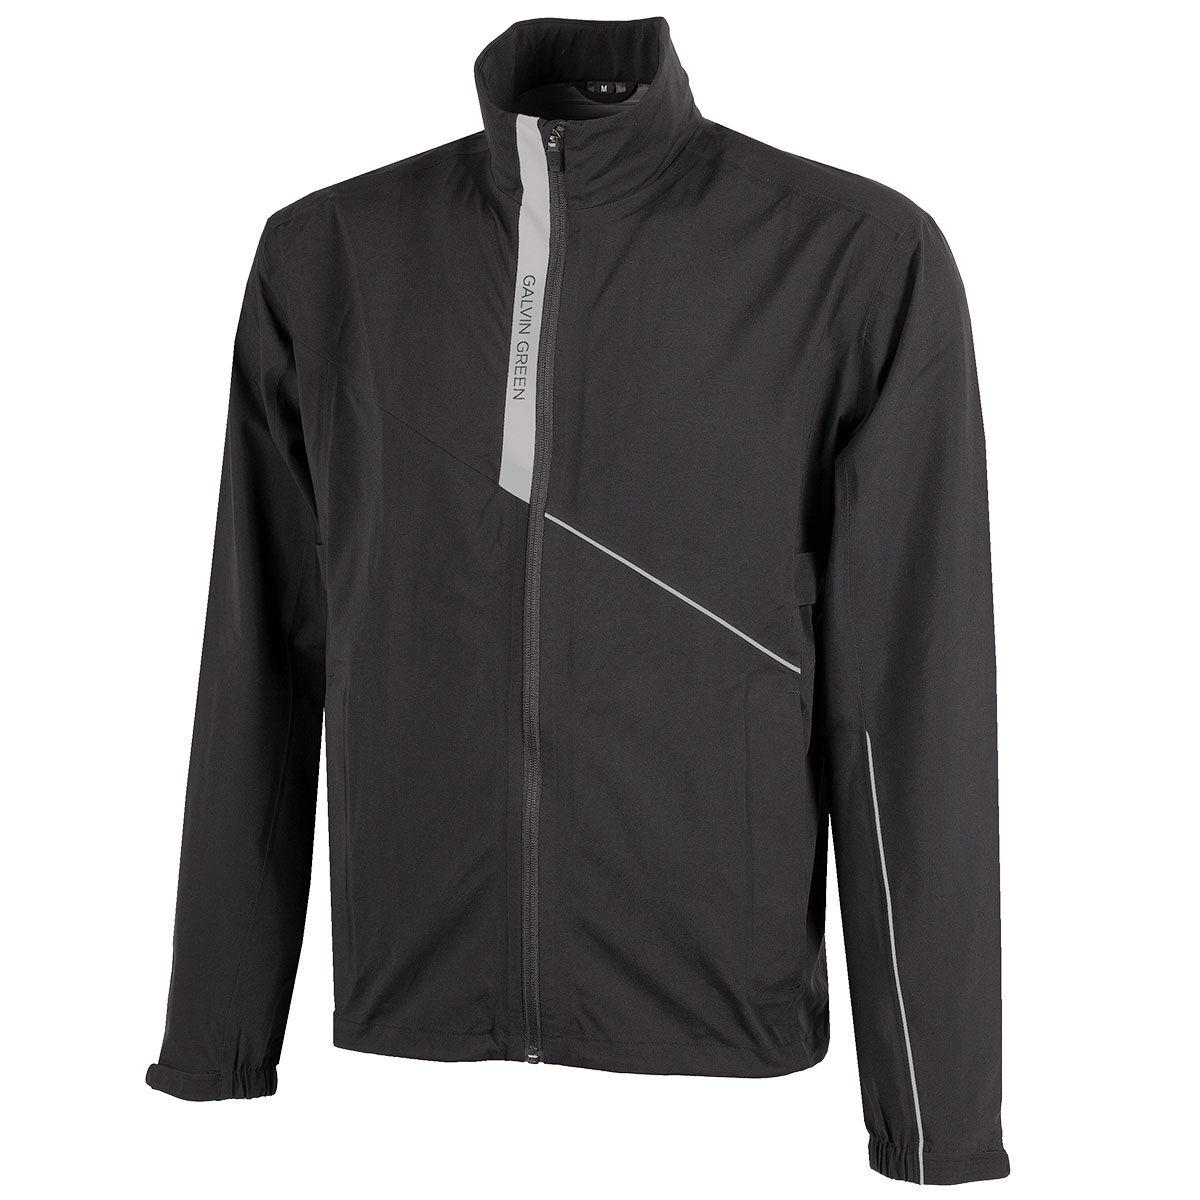 Galvin Green Apollo Golf Jacket, Mens, Black/sharkskin, Large   American Golf